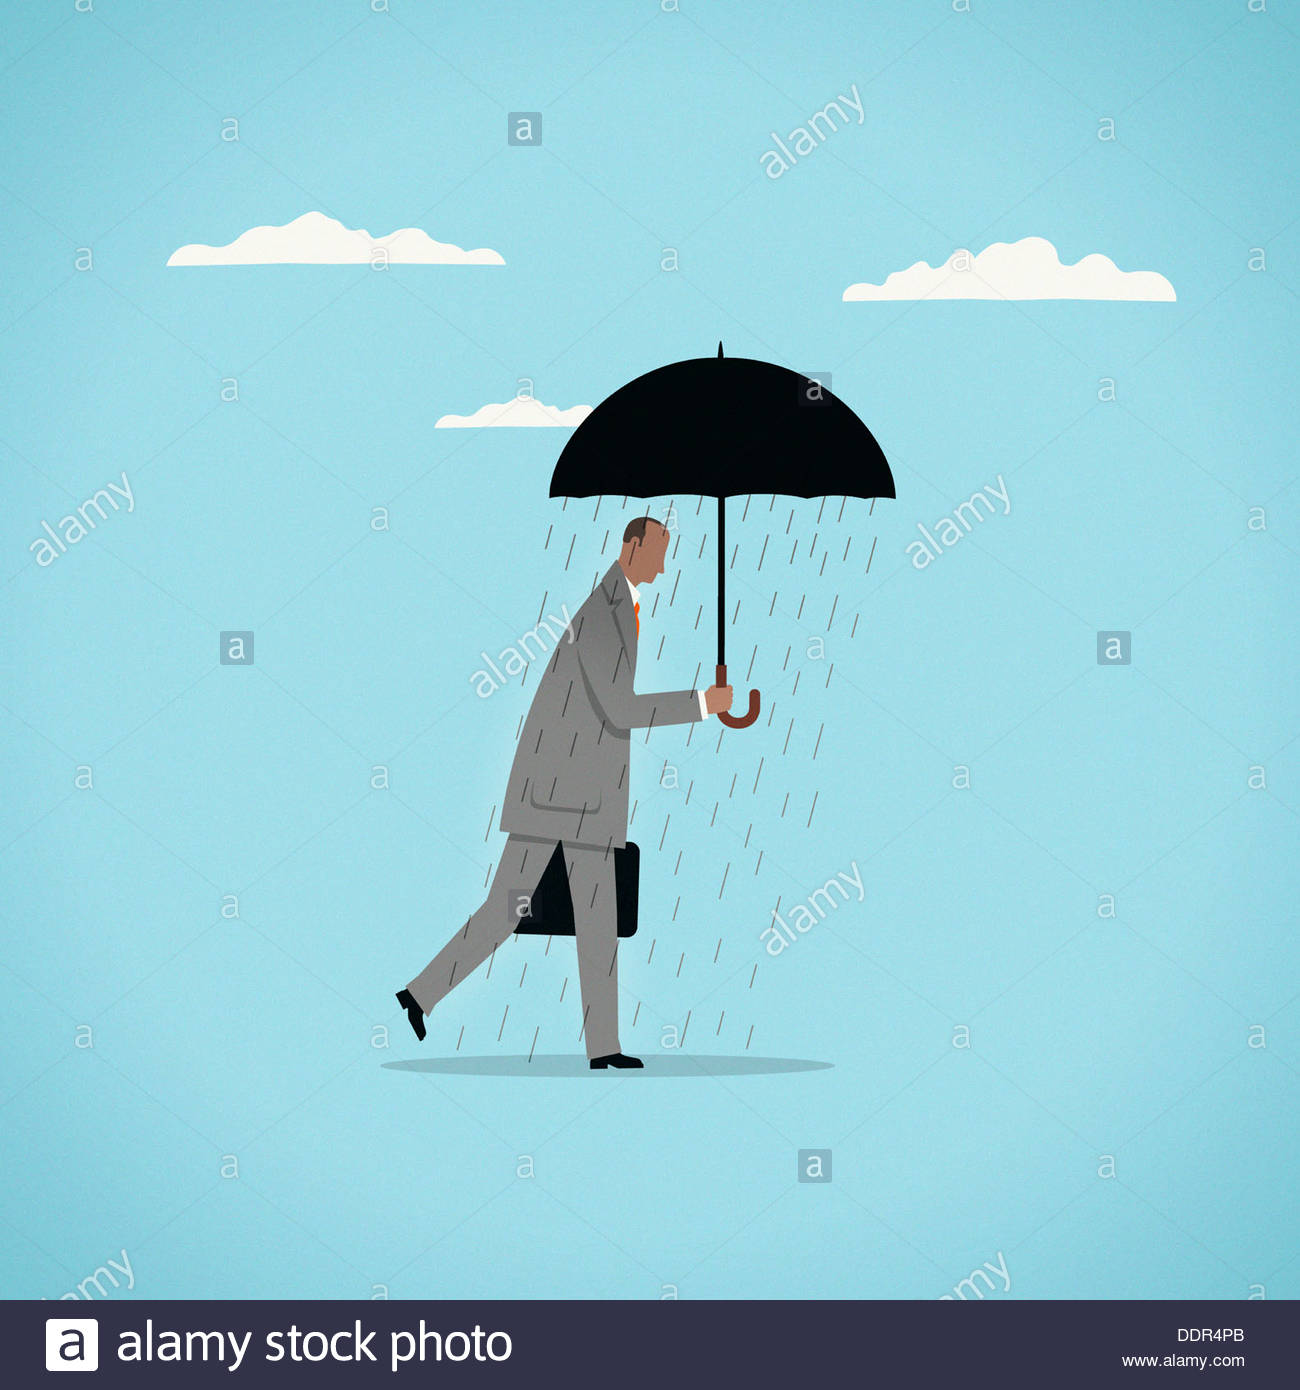 Rain falling from under umbrella on businessman - Stock Image